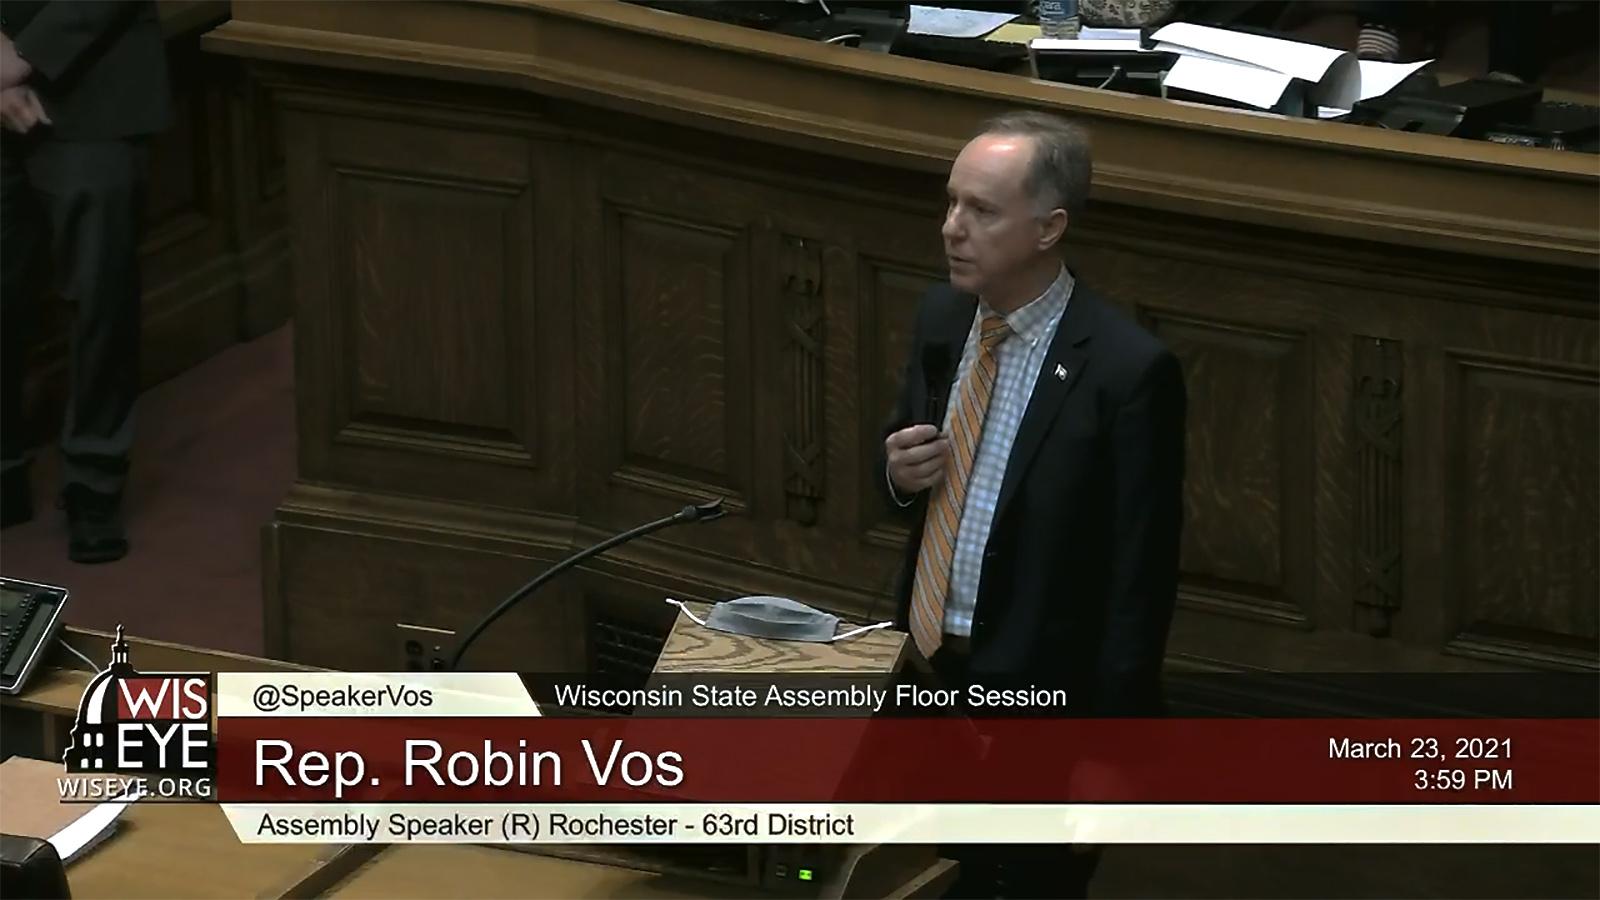 A WisconsinEye screenshot of Wisconsin Assembly Speaker Robin Vos speaking in a legislative session.